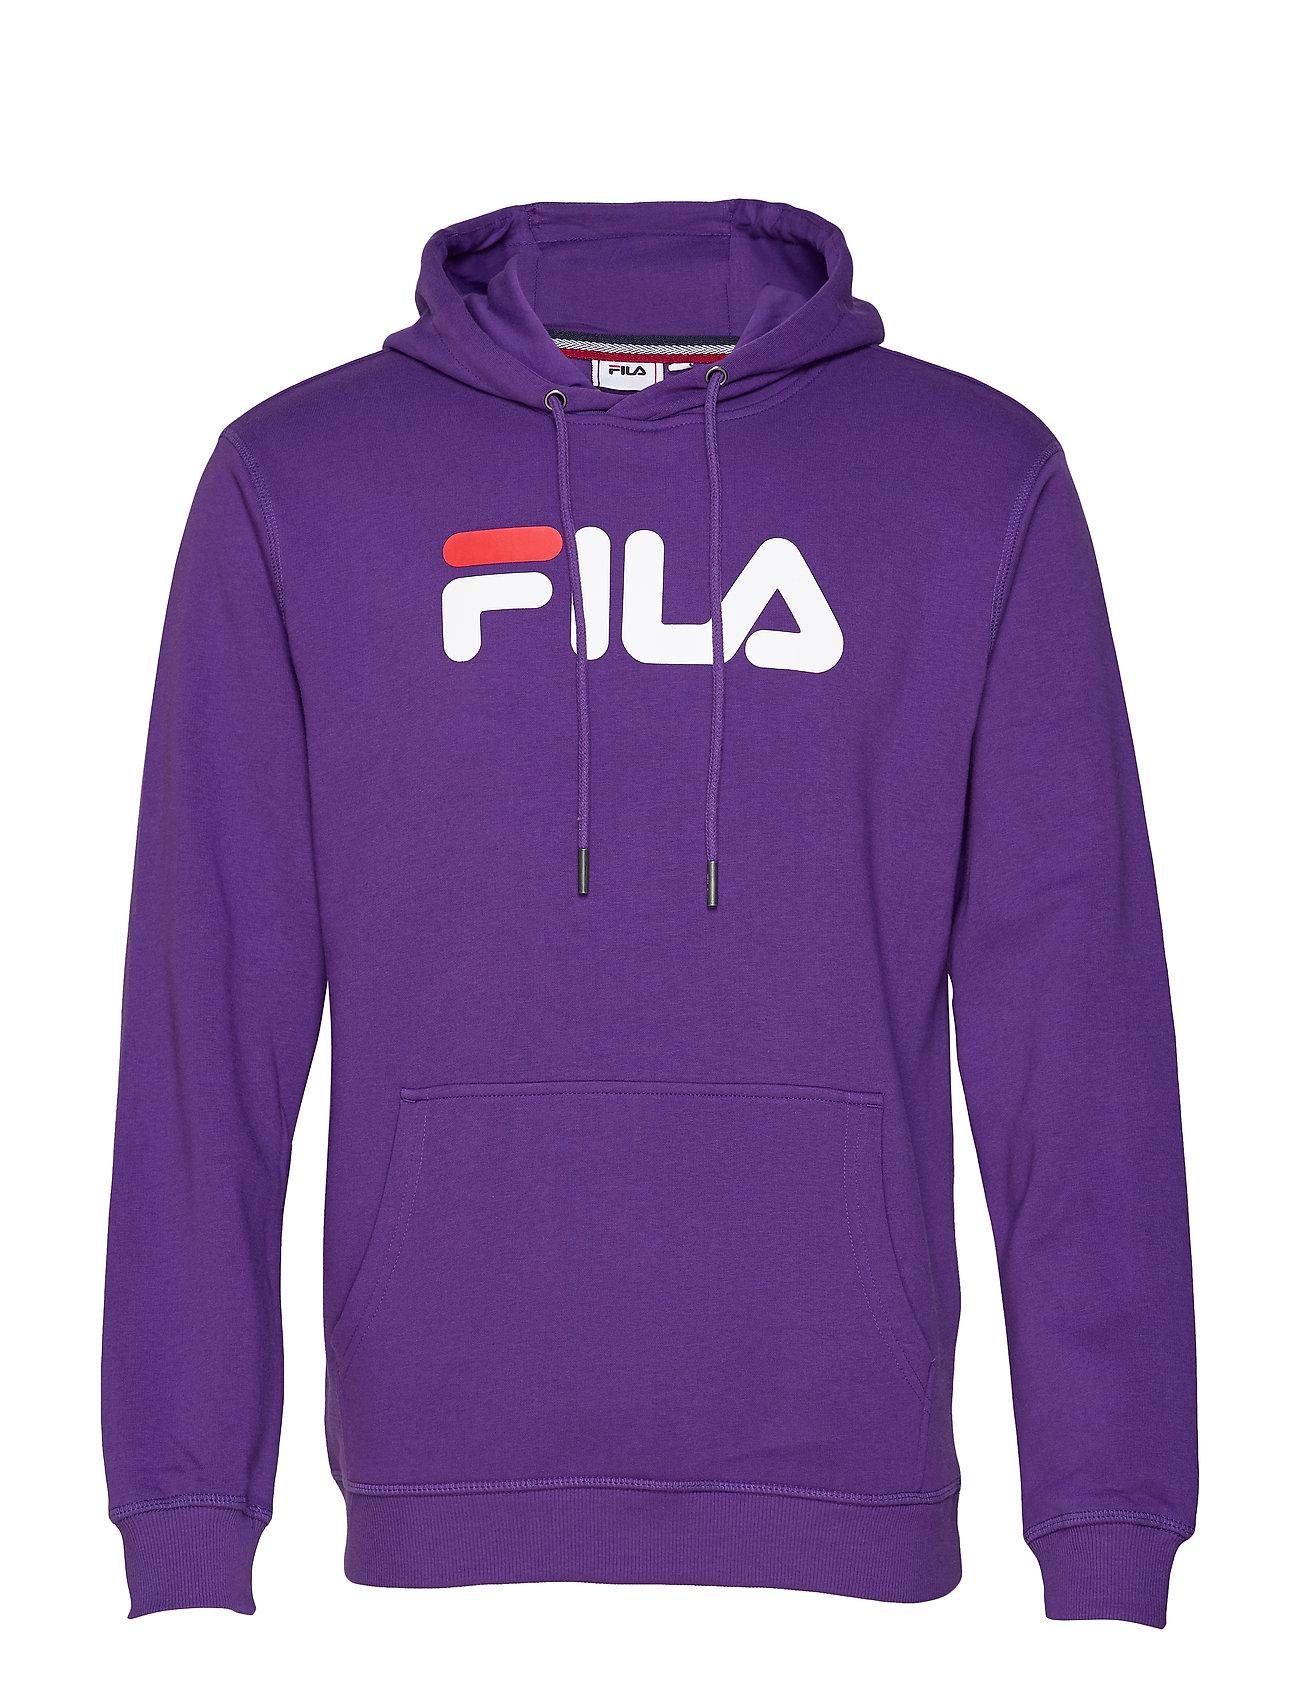 FILA UNISEX CLASSIC PURE hoody - TILLANDSIA PURPLE